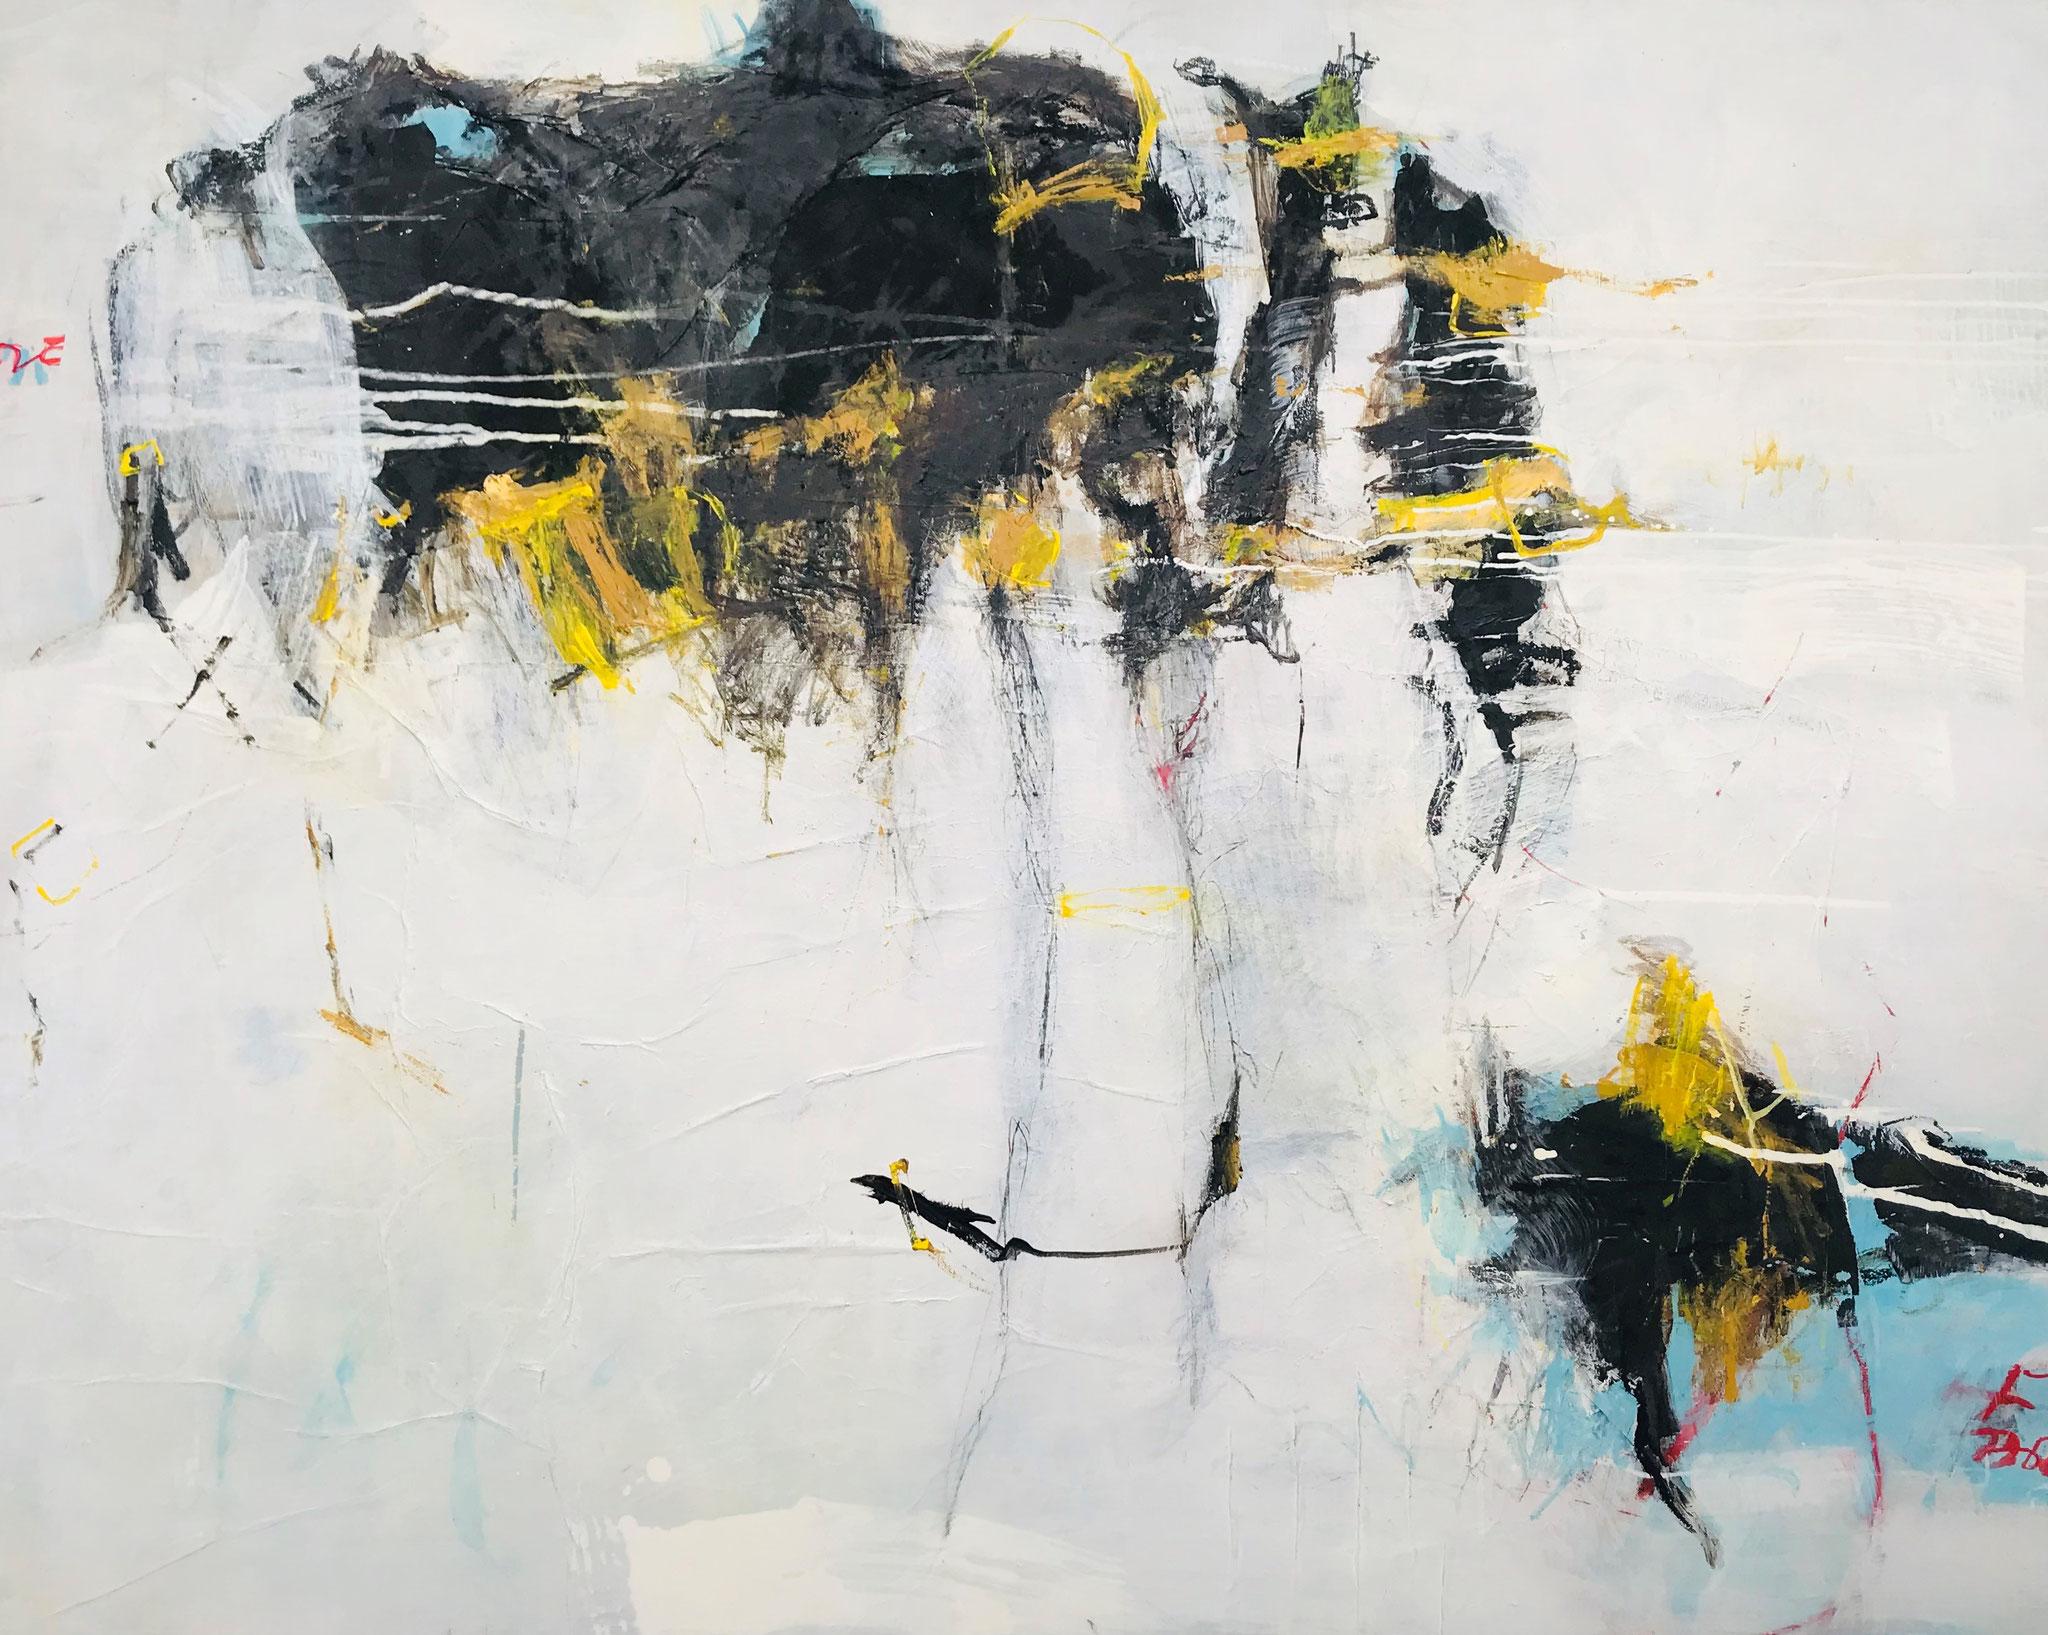 """Impression S.A."", MT auf Leinwand, 120x150 cm, 2019"